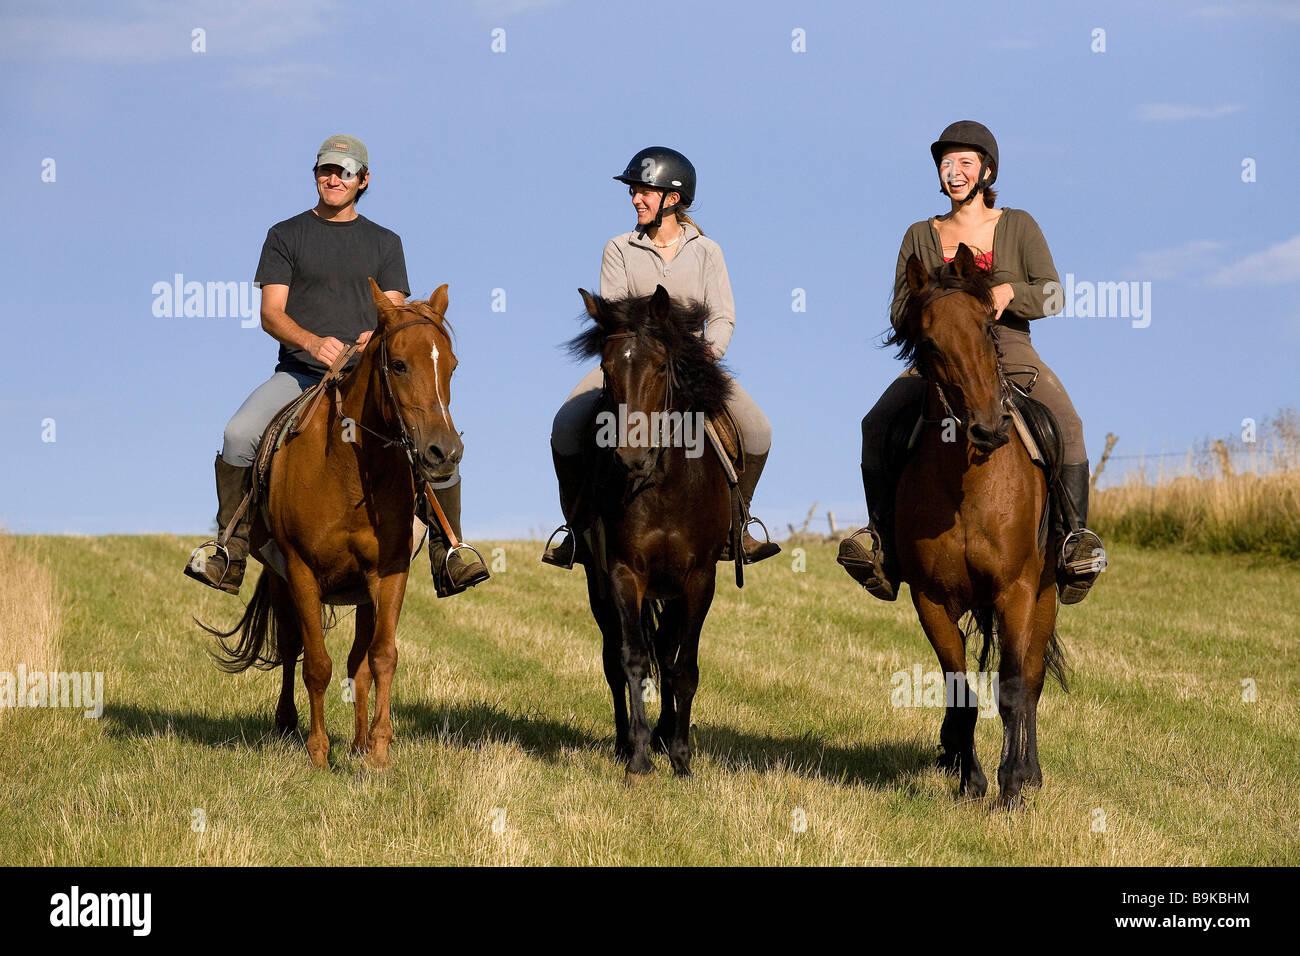 France, Aveyron, Aubrac area, Centre Equestre de l'Aubrac (Aubrac equestrian center, horse riding - Stock Image